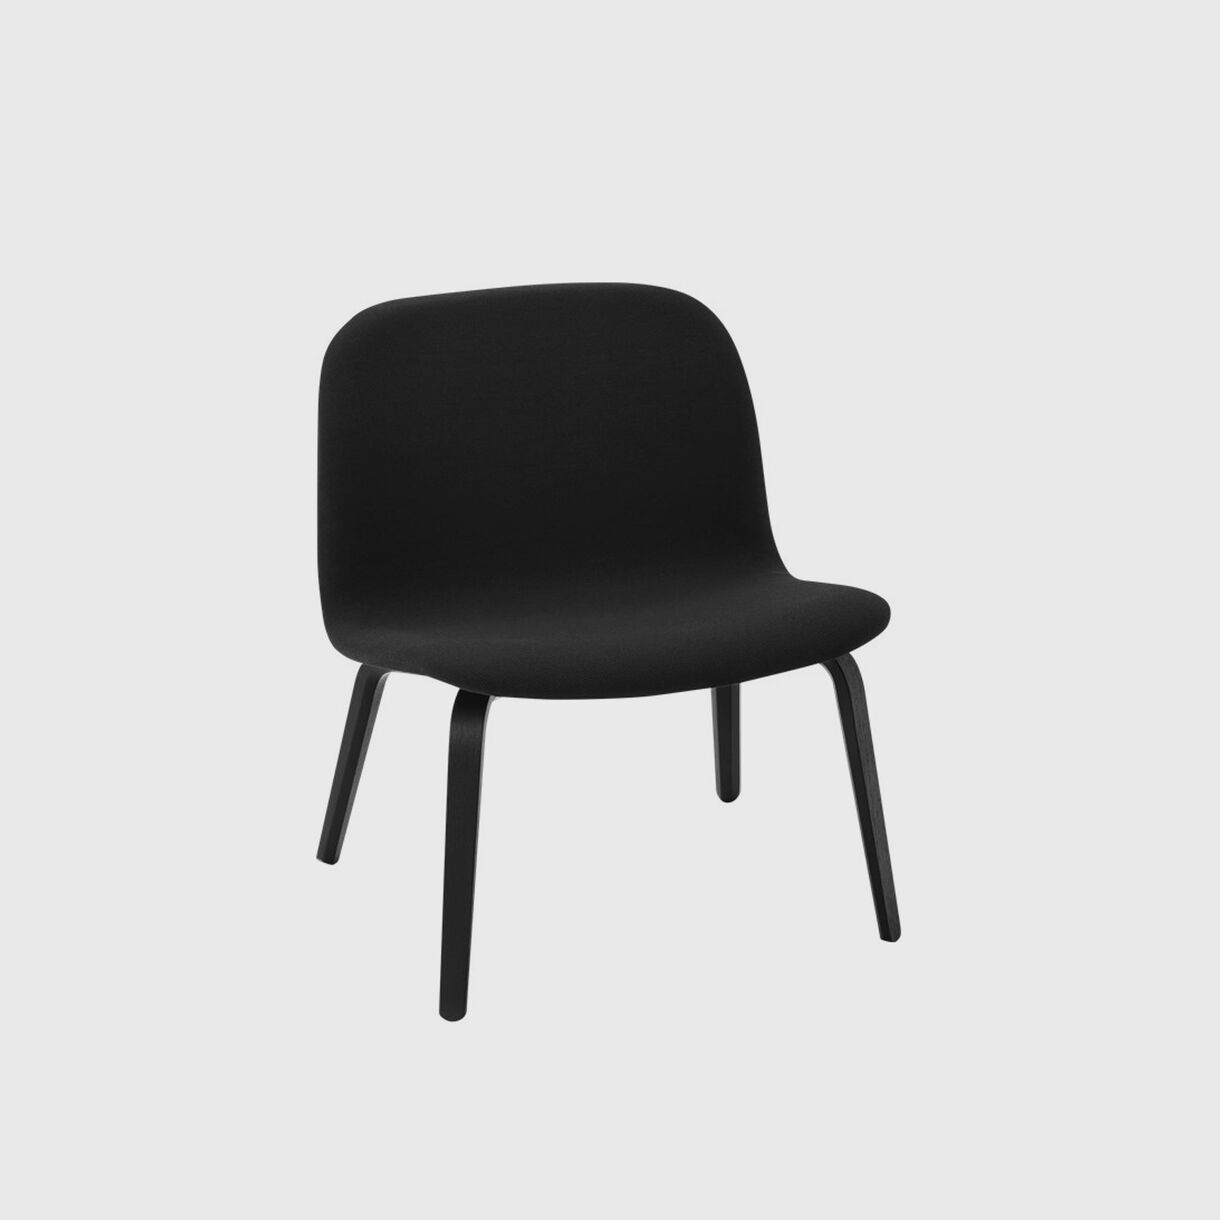 Visu Lounge Chair Upholstered, Steelcut 190